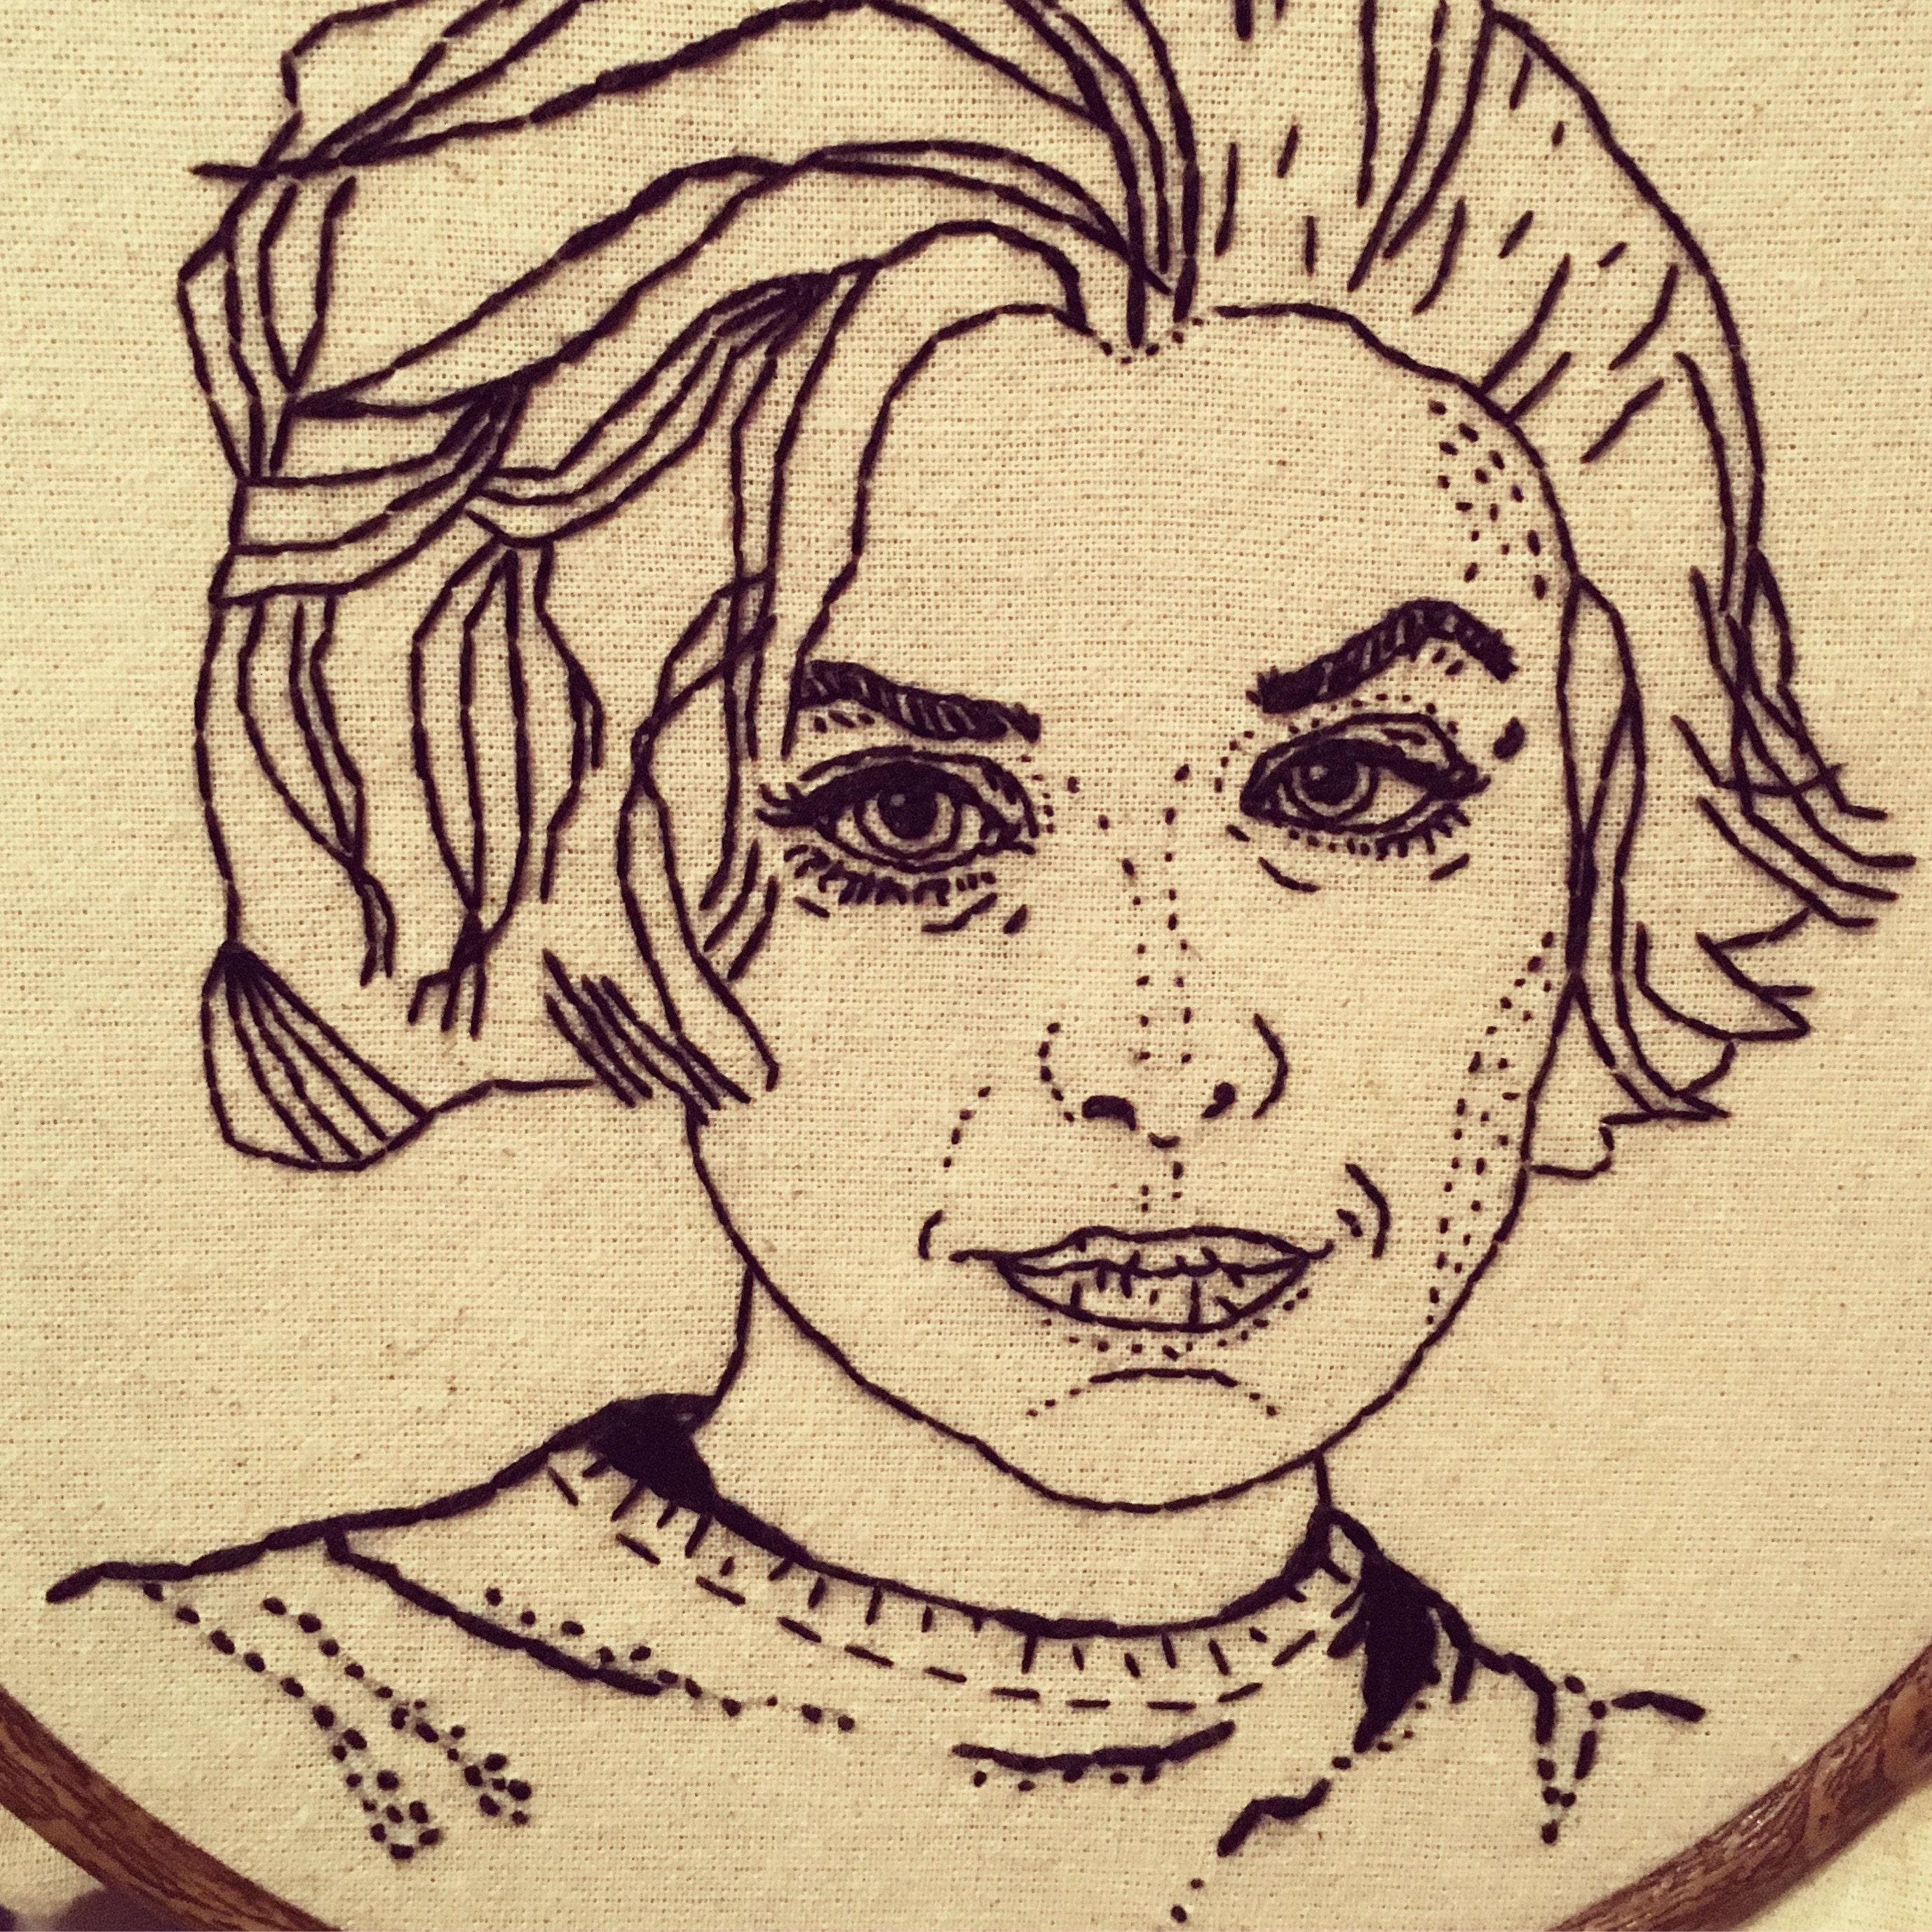 Hand Embroidery. Hoop Art. Jane Austen. Persuasion. Wall